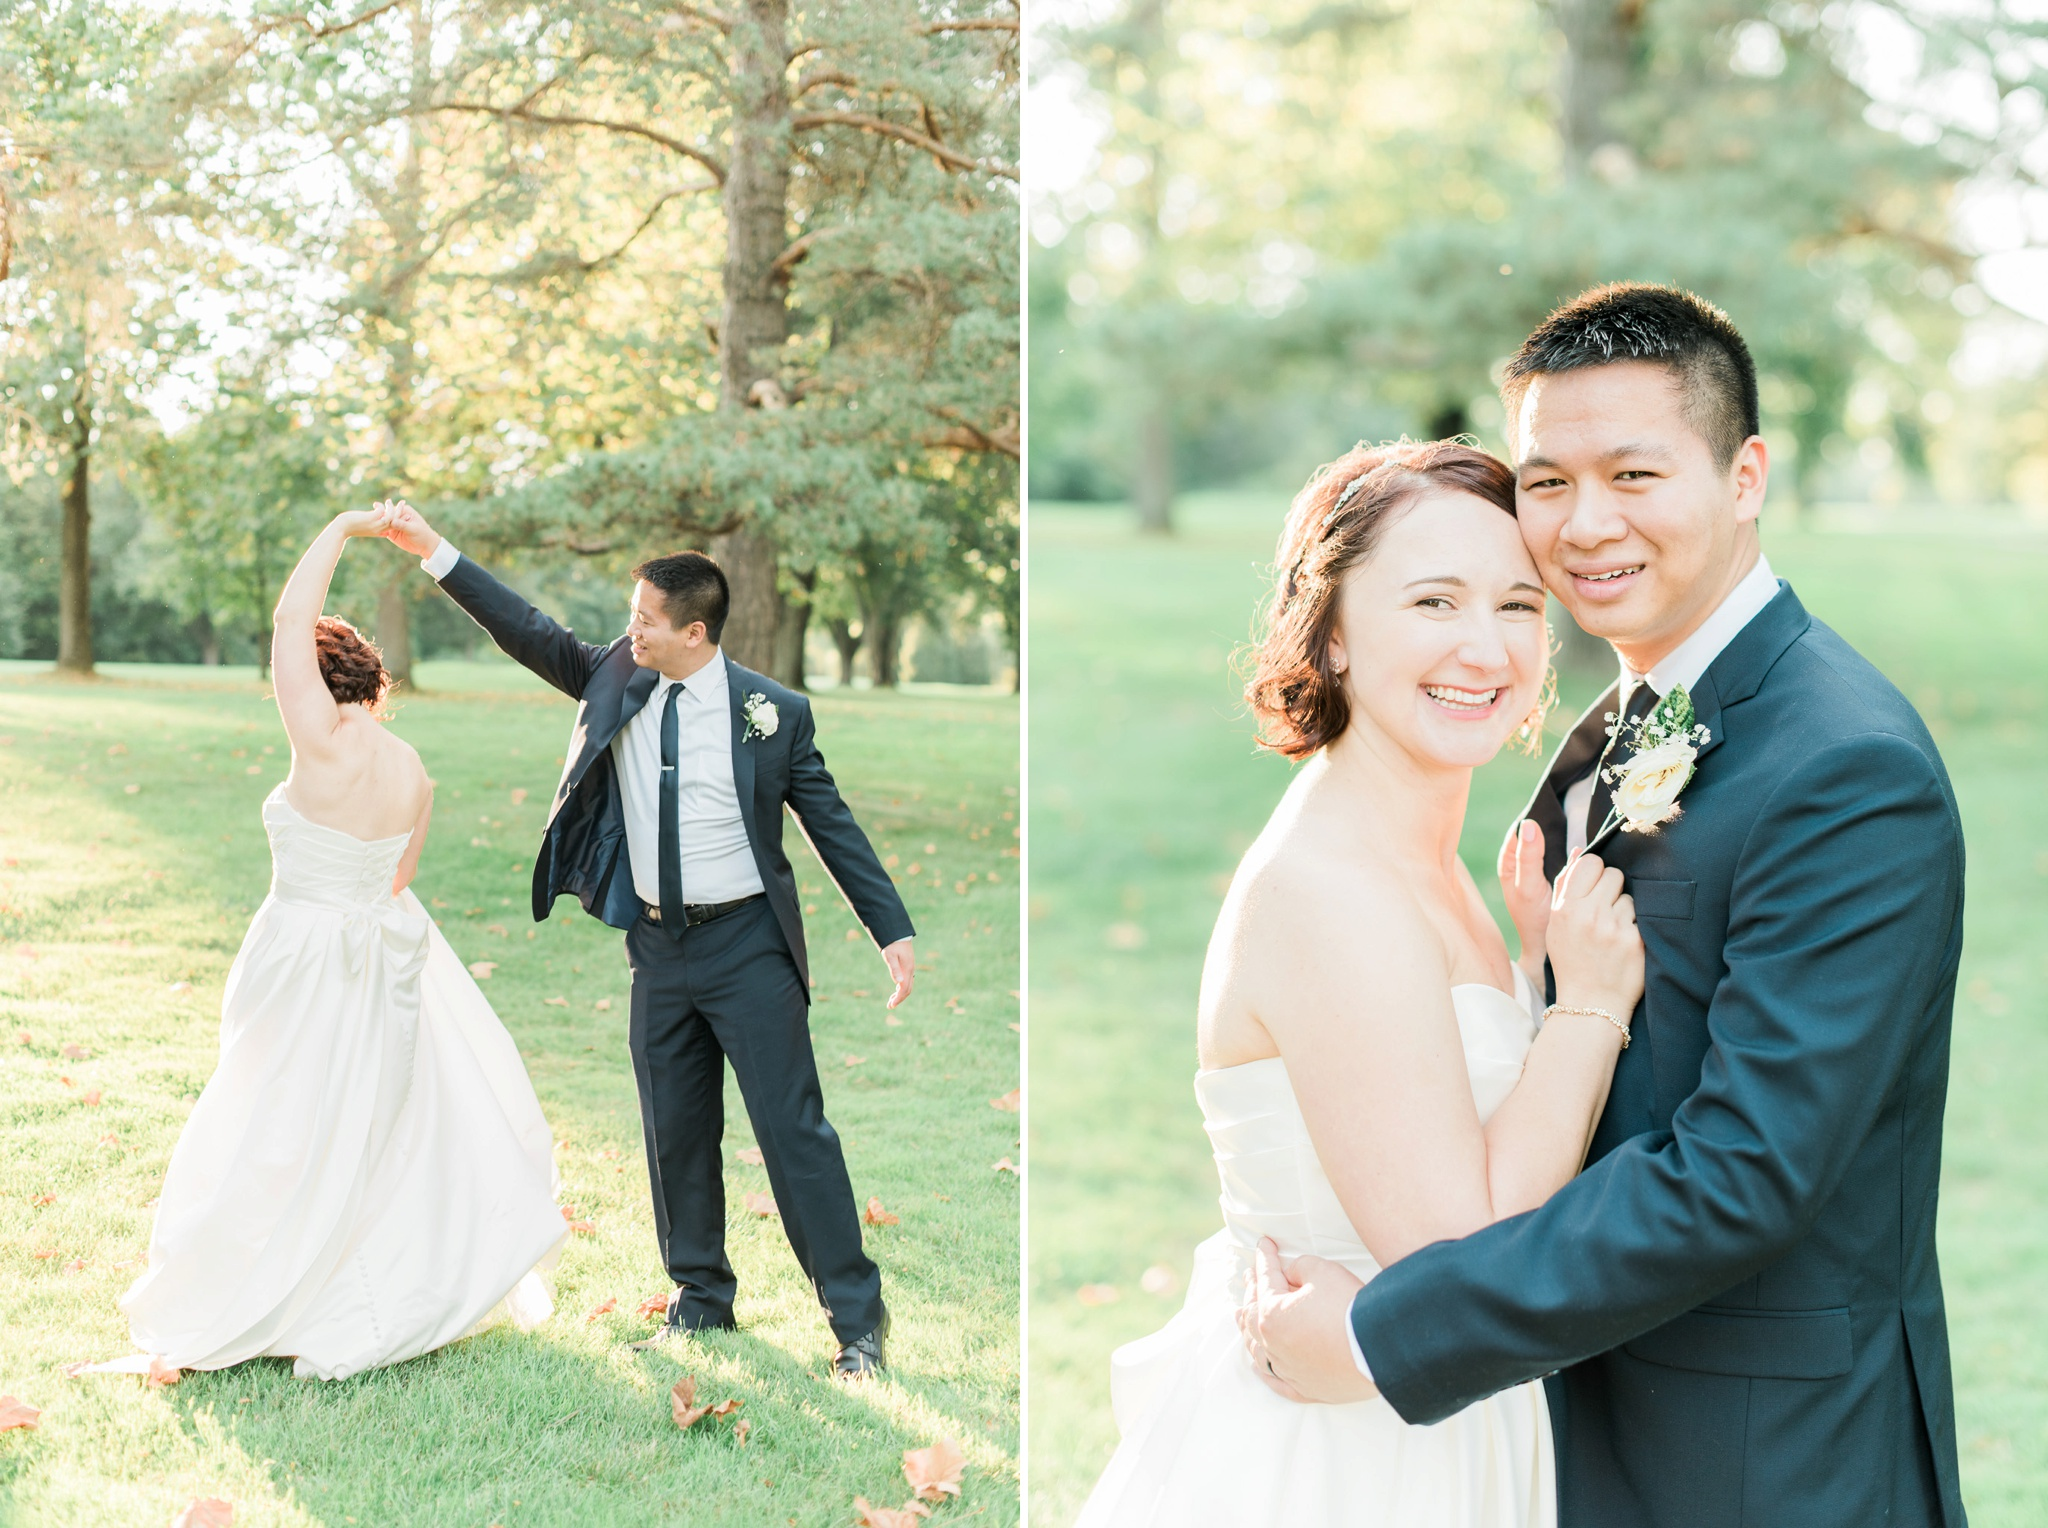 brookside-golf-country-club-wedding-columbus-ohio-123.jpg